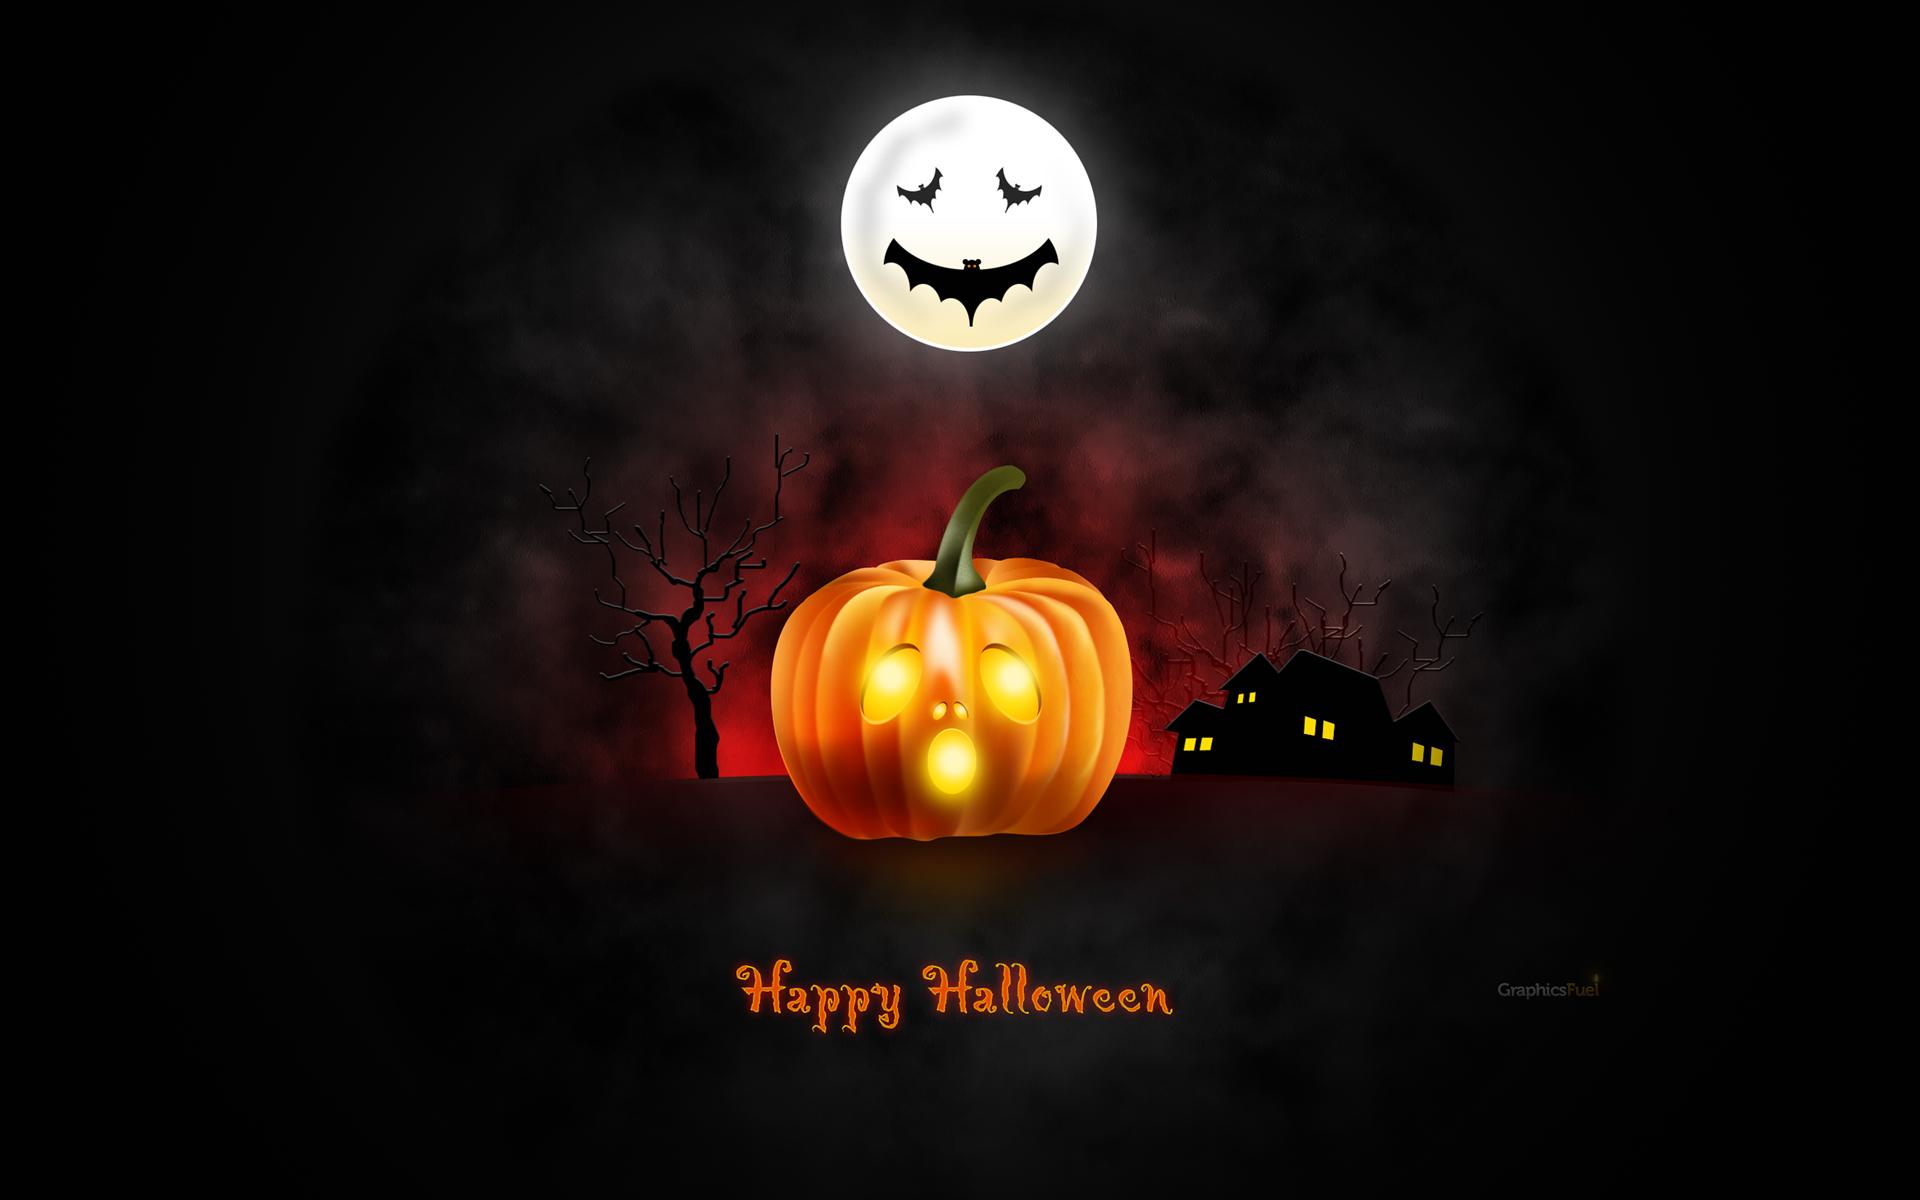 Halloween wallpaper for desktop iPad iPhone PSD icons 1920x1200